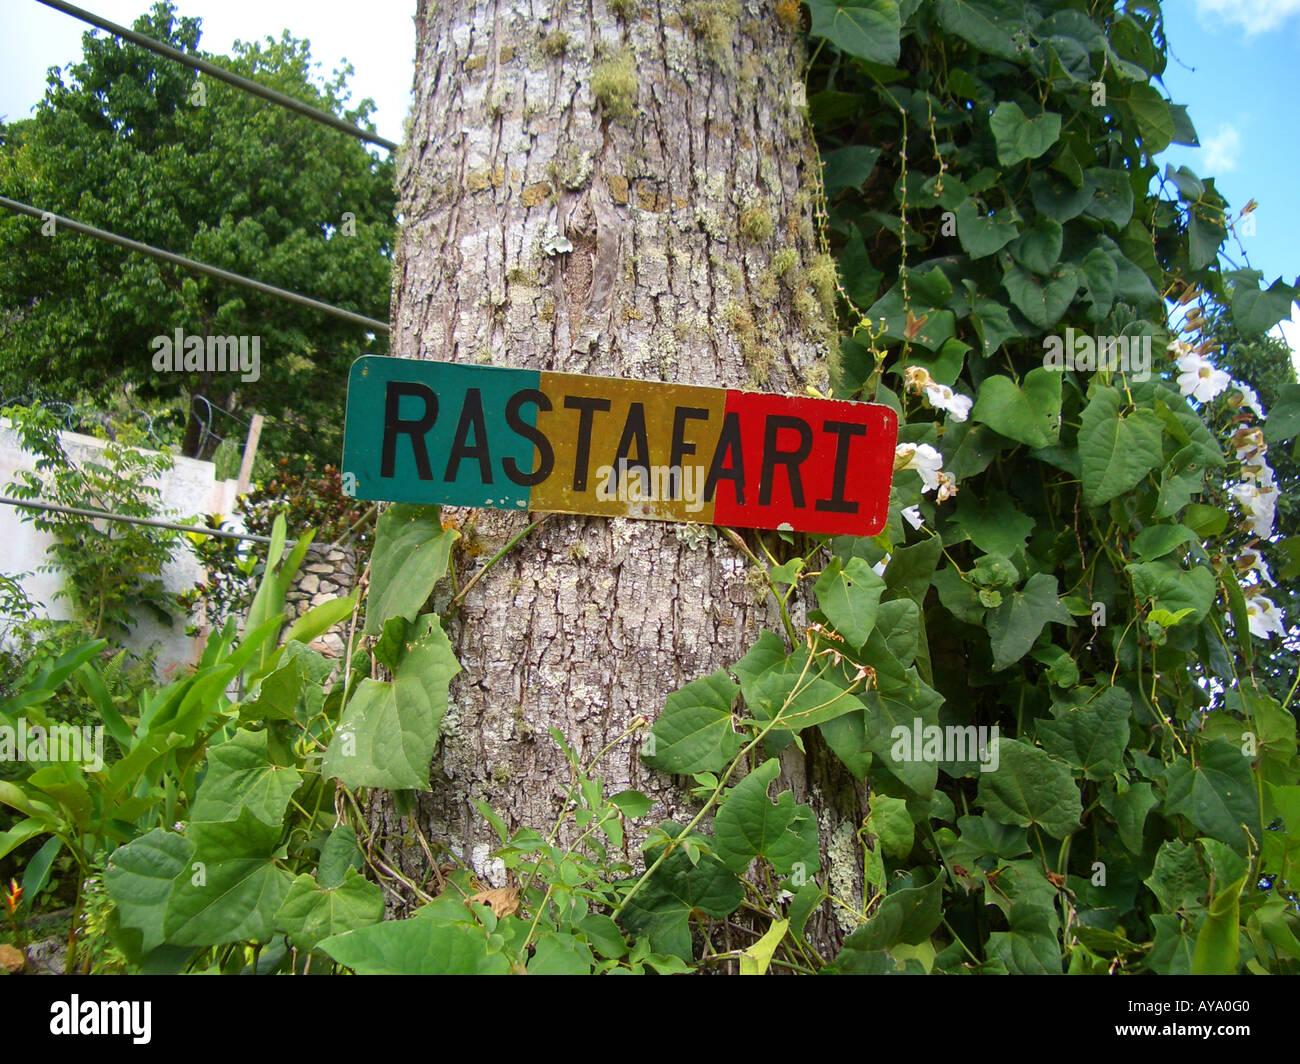 Rastafari sign stock photos rastafari sign stock images alamy rastafari sign jamaica stock image biocorpaavc Image collections